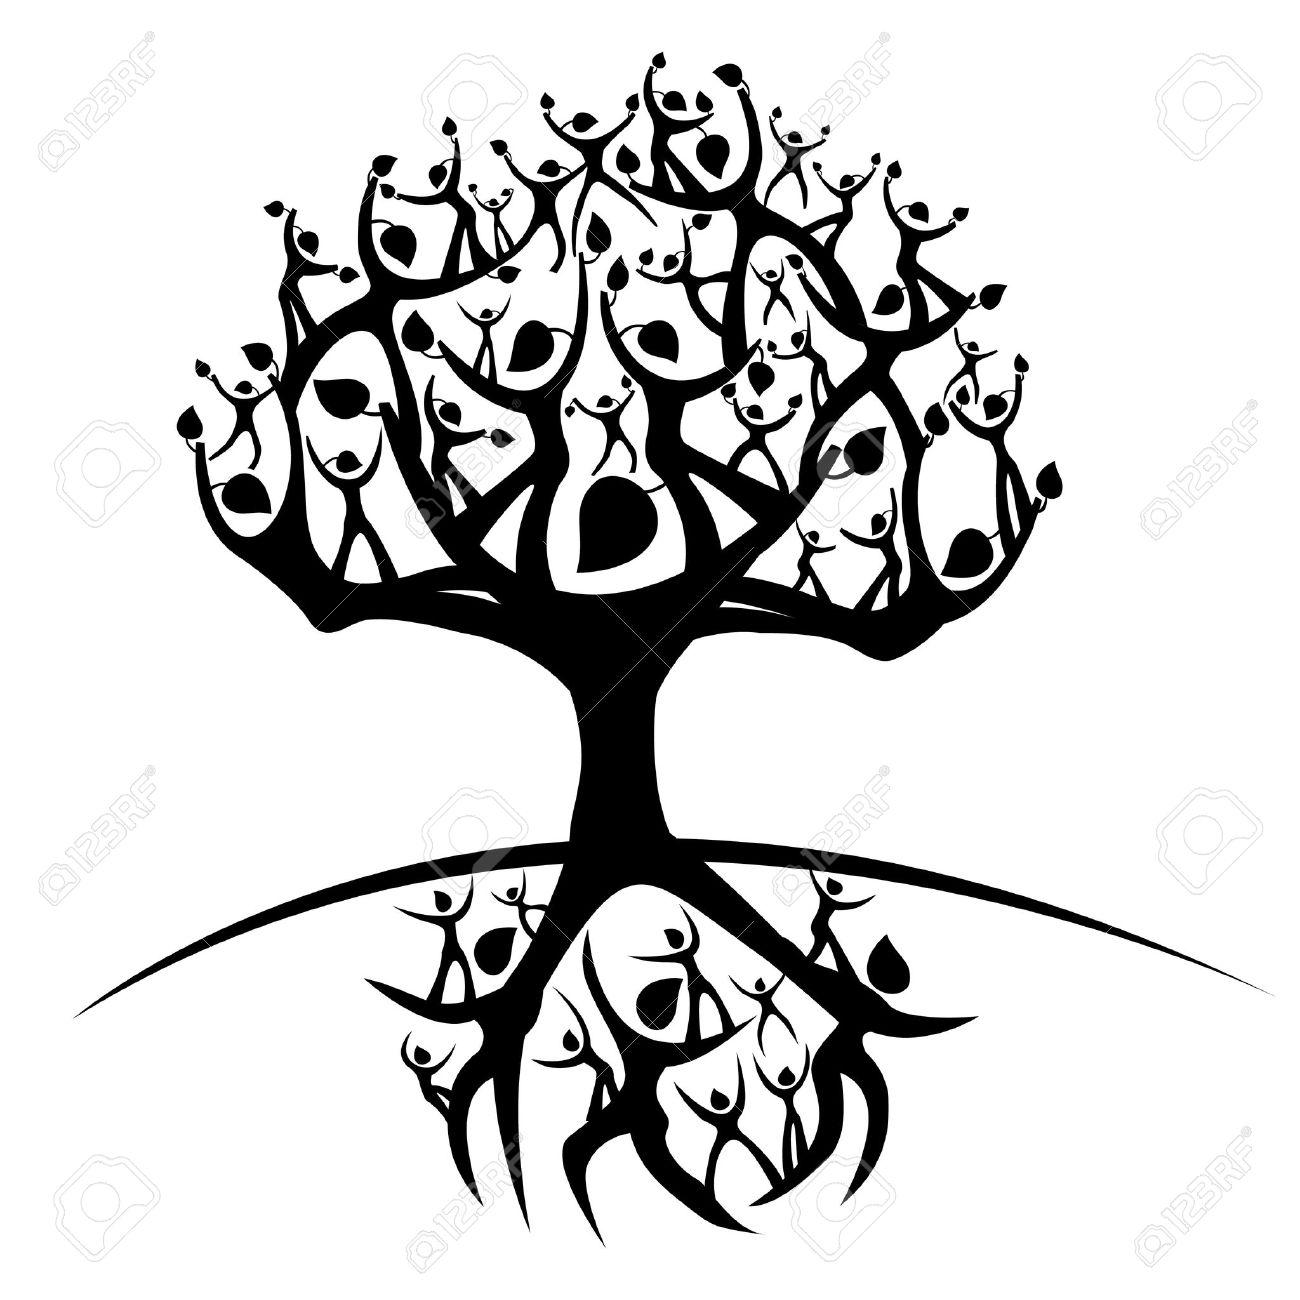 tree roots : illustration of